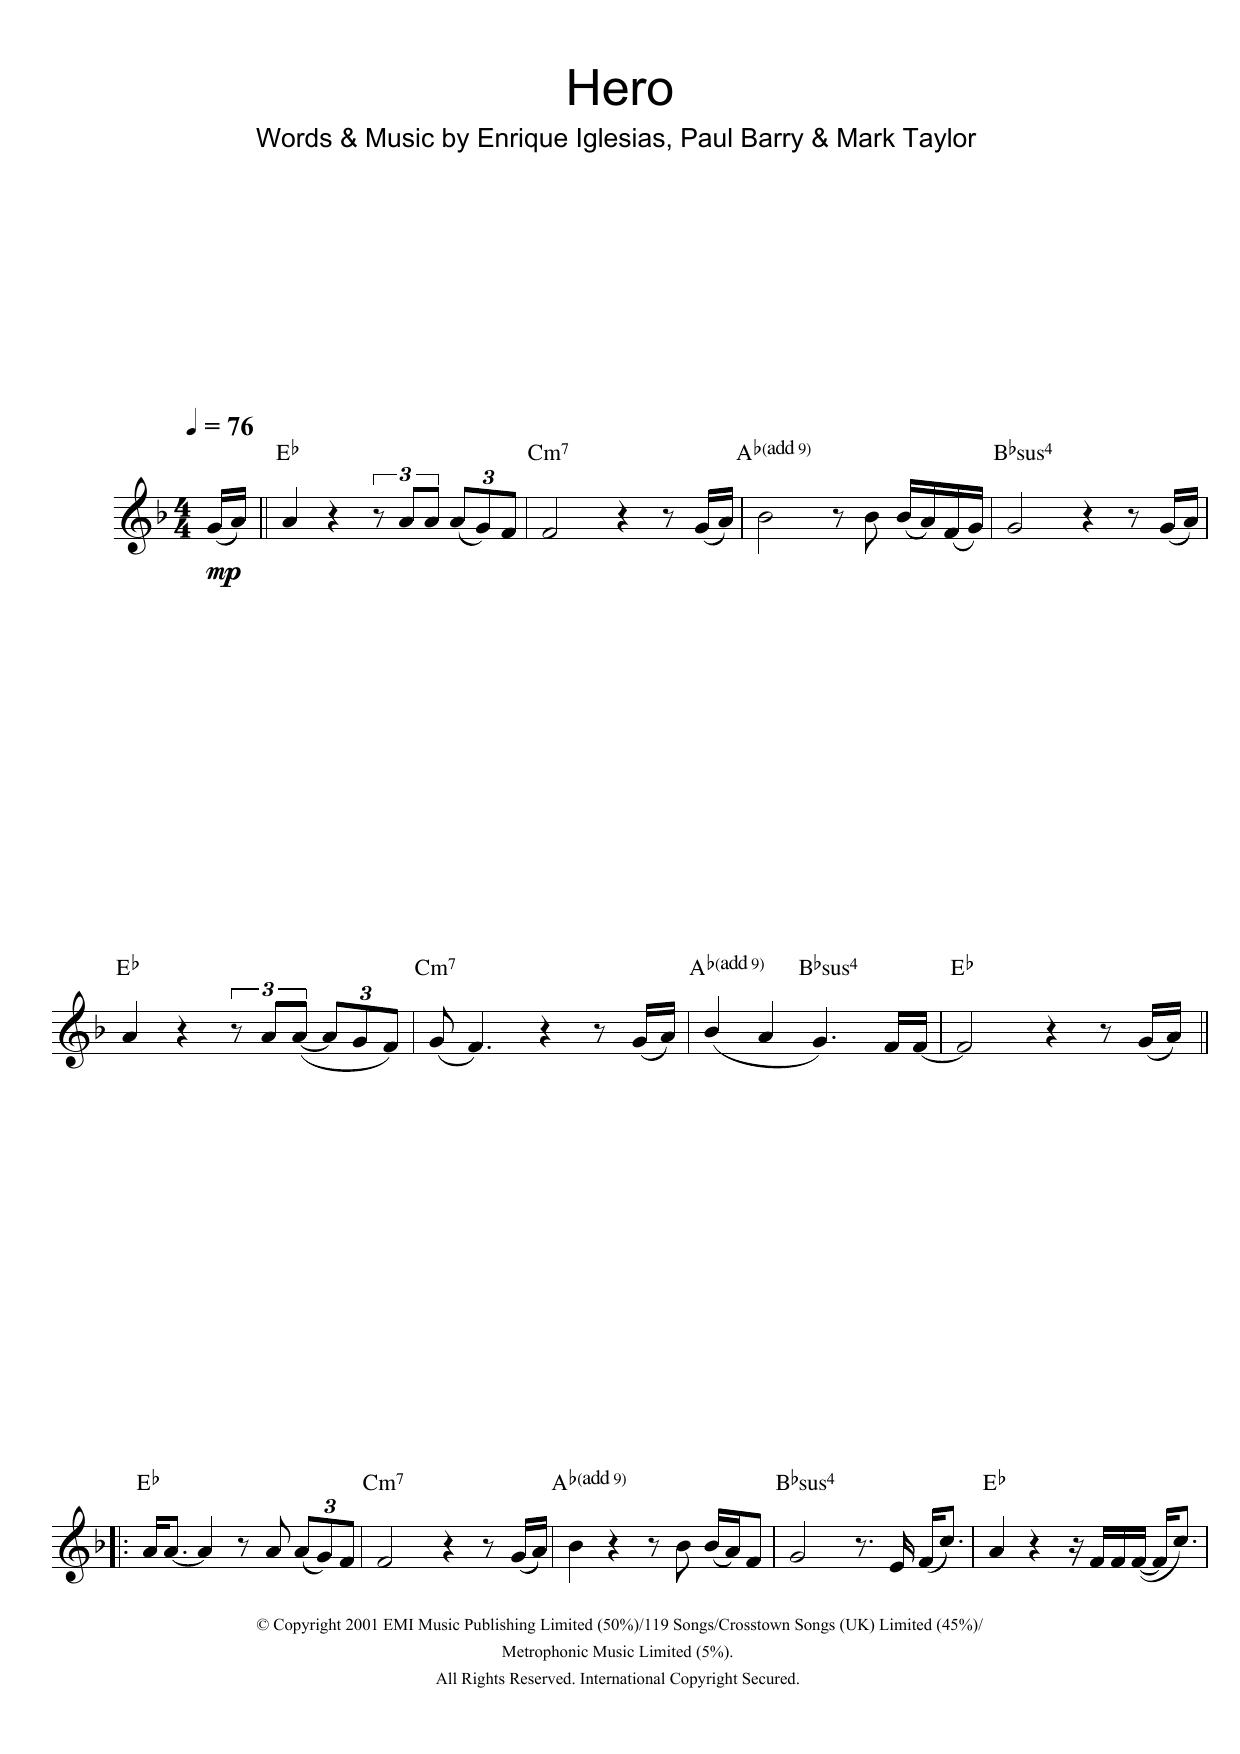 Sheet Music Digital Files To Print Licensed Enrique Iglesias